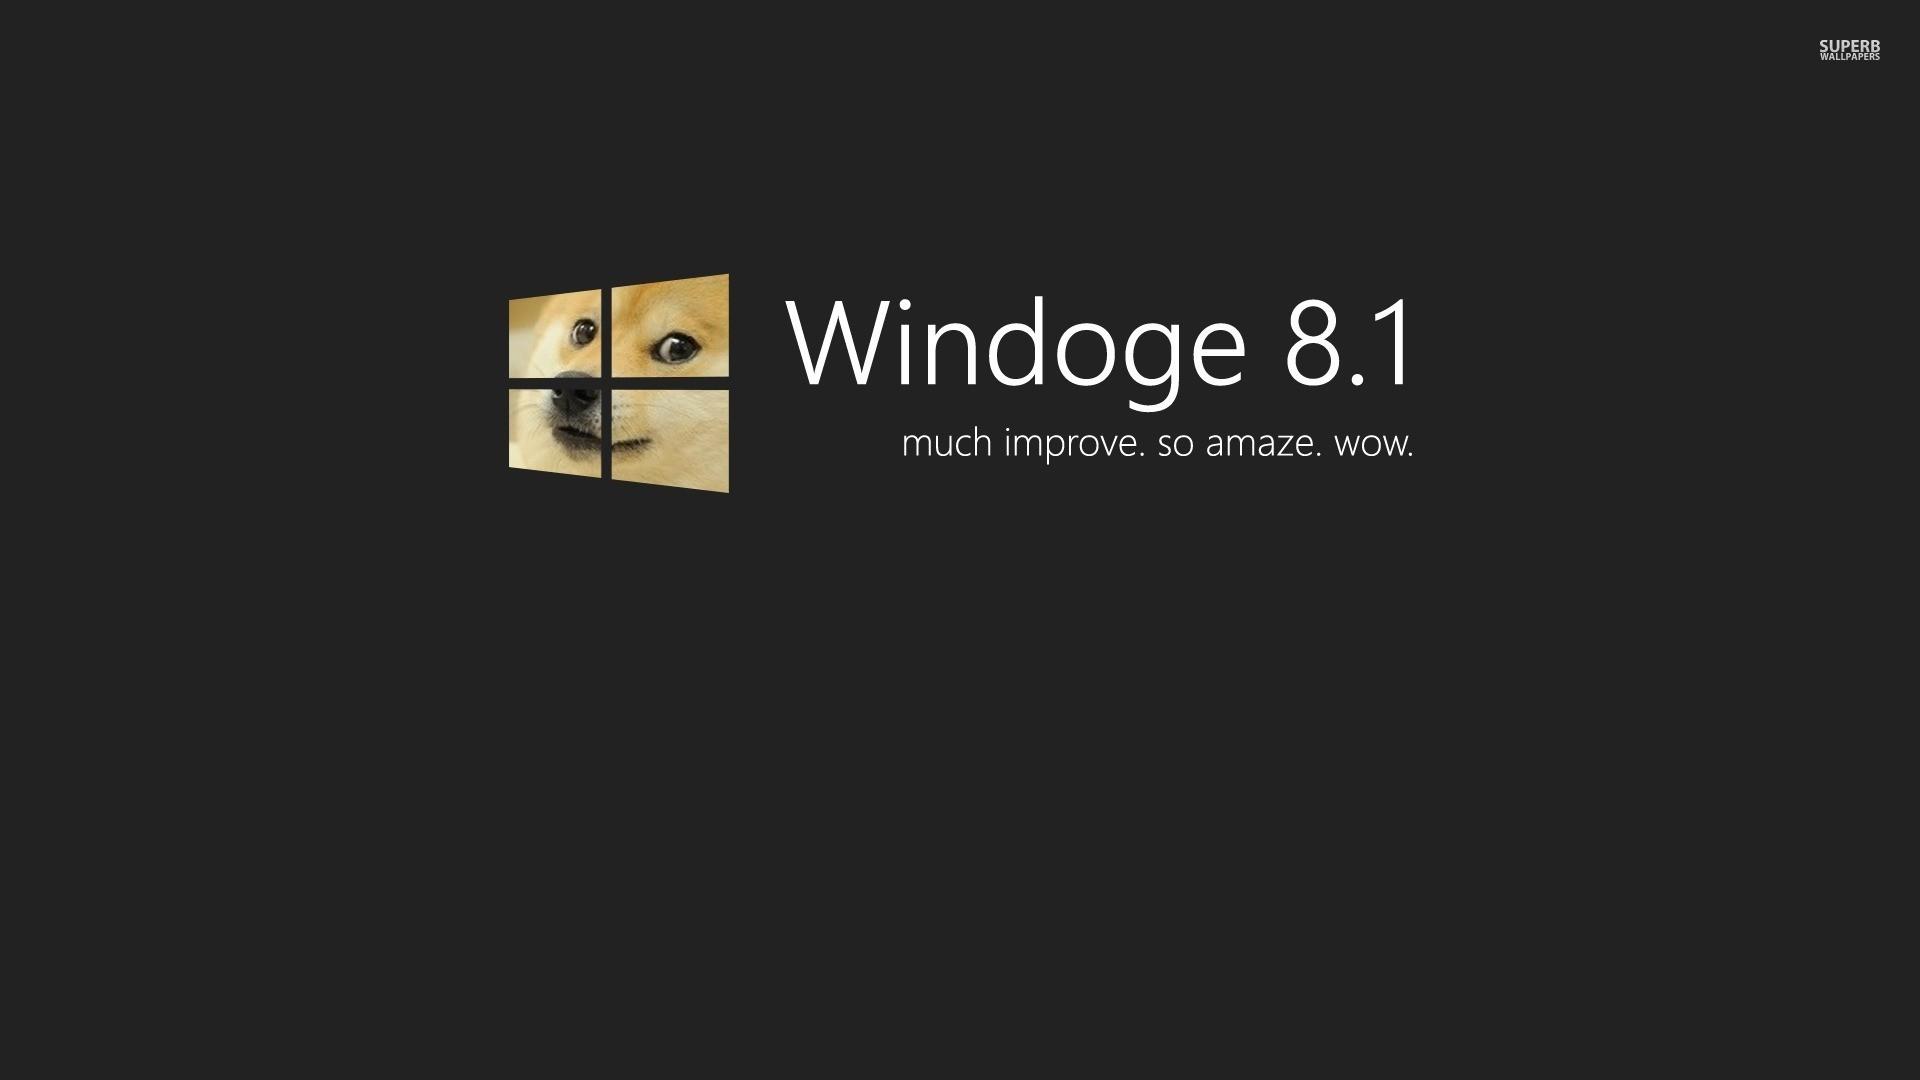 Doge Windows 8.1 Wallpaper – MixHD wallpapers